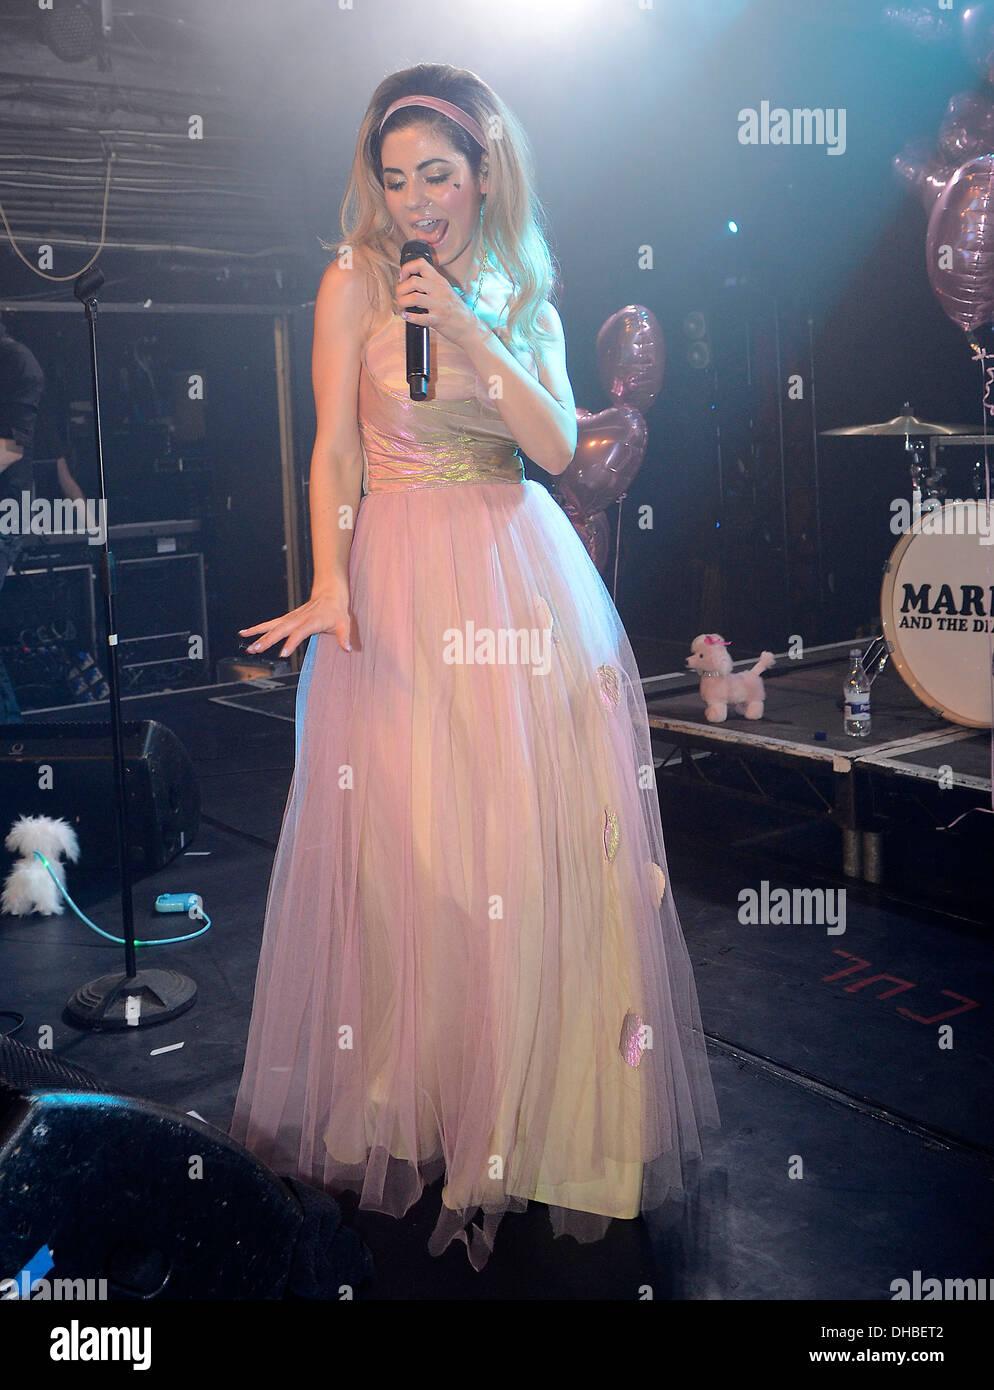 Marina Diamandis Marina Diamonds Performs Imágenes De Stock & Marina ...